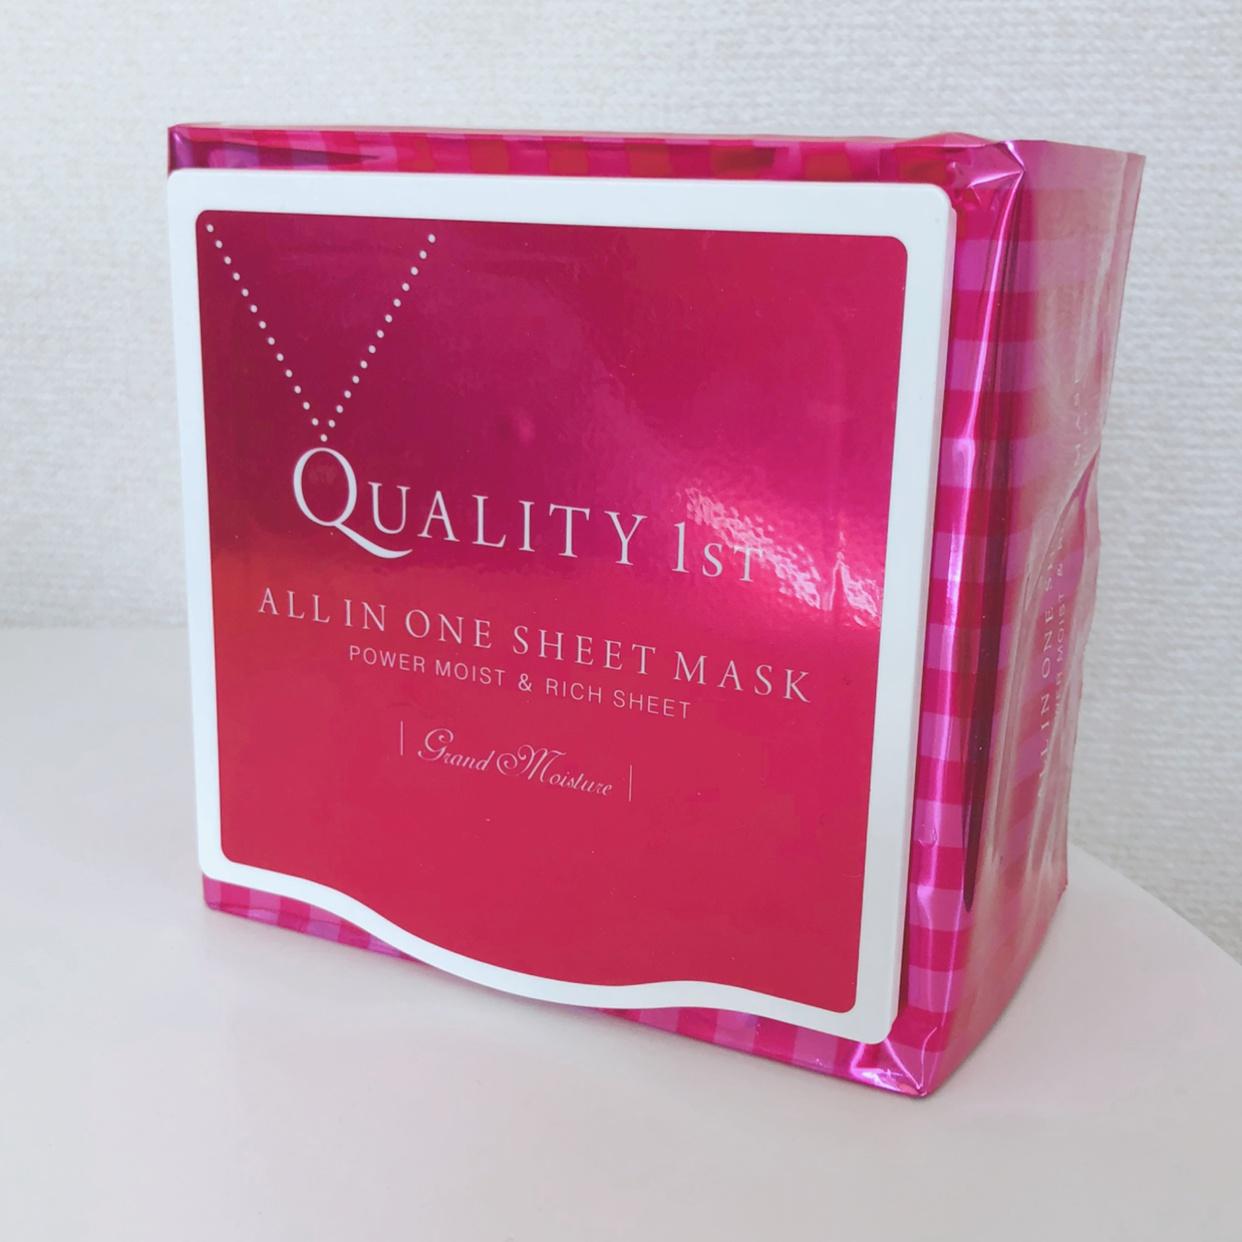 Quality 1st(クオリティファースト) オールインワンシートマスク グランモイストを使ったn a oさんのクチコミ画像1